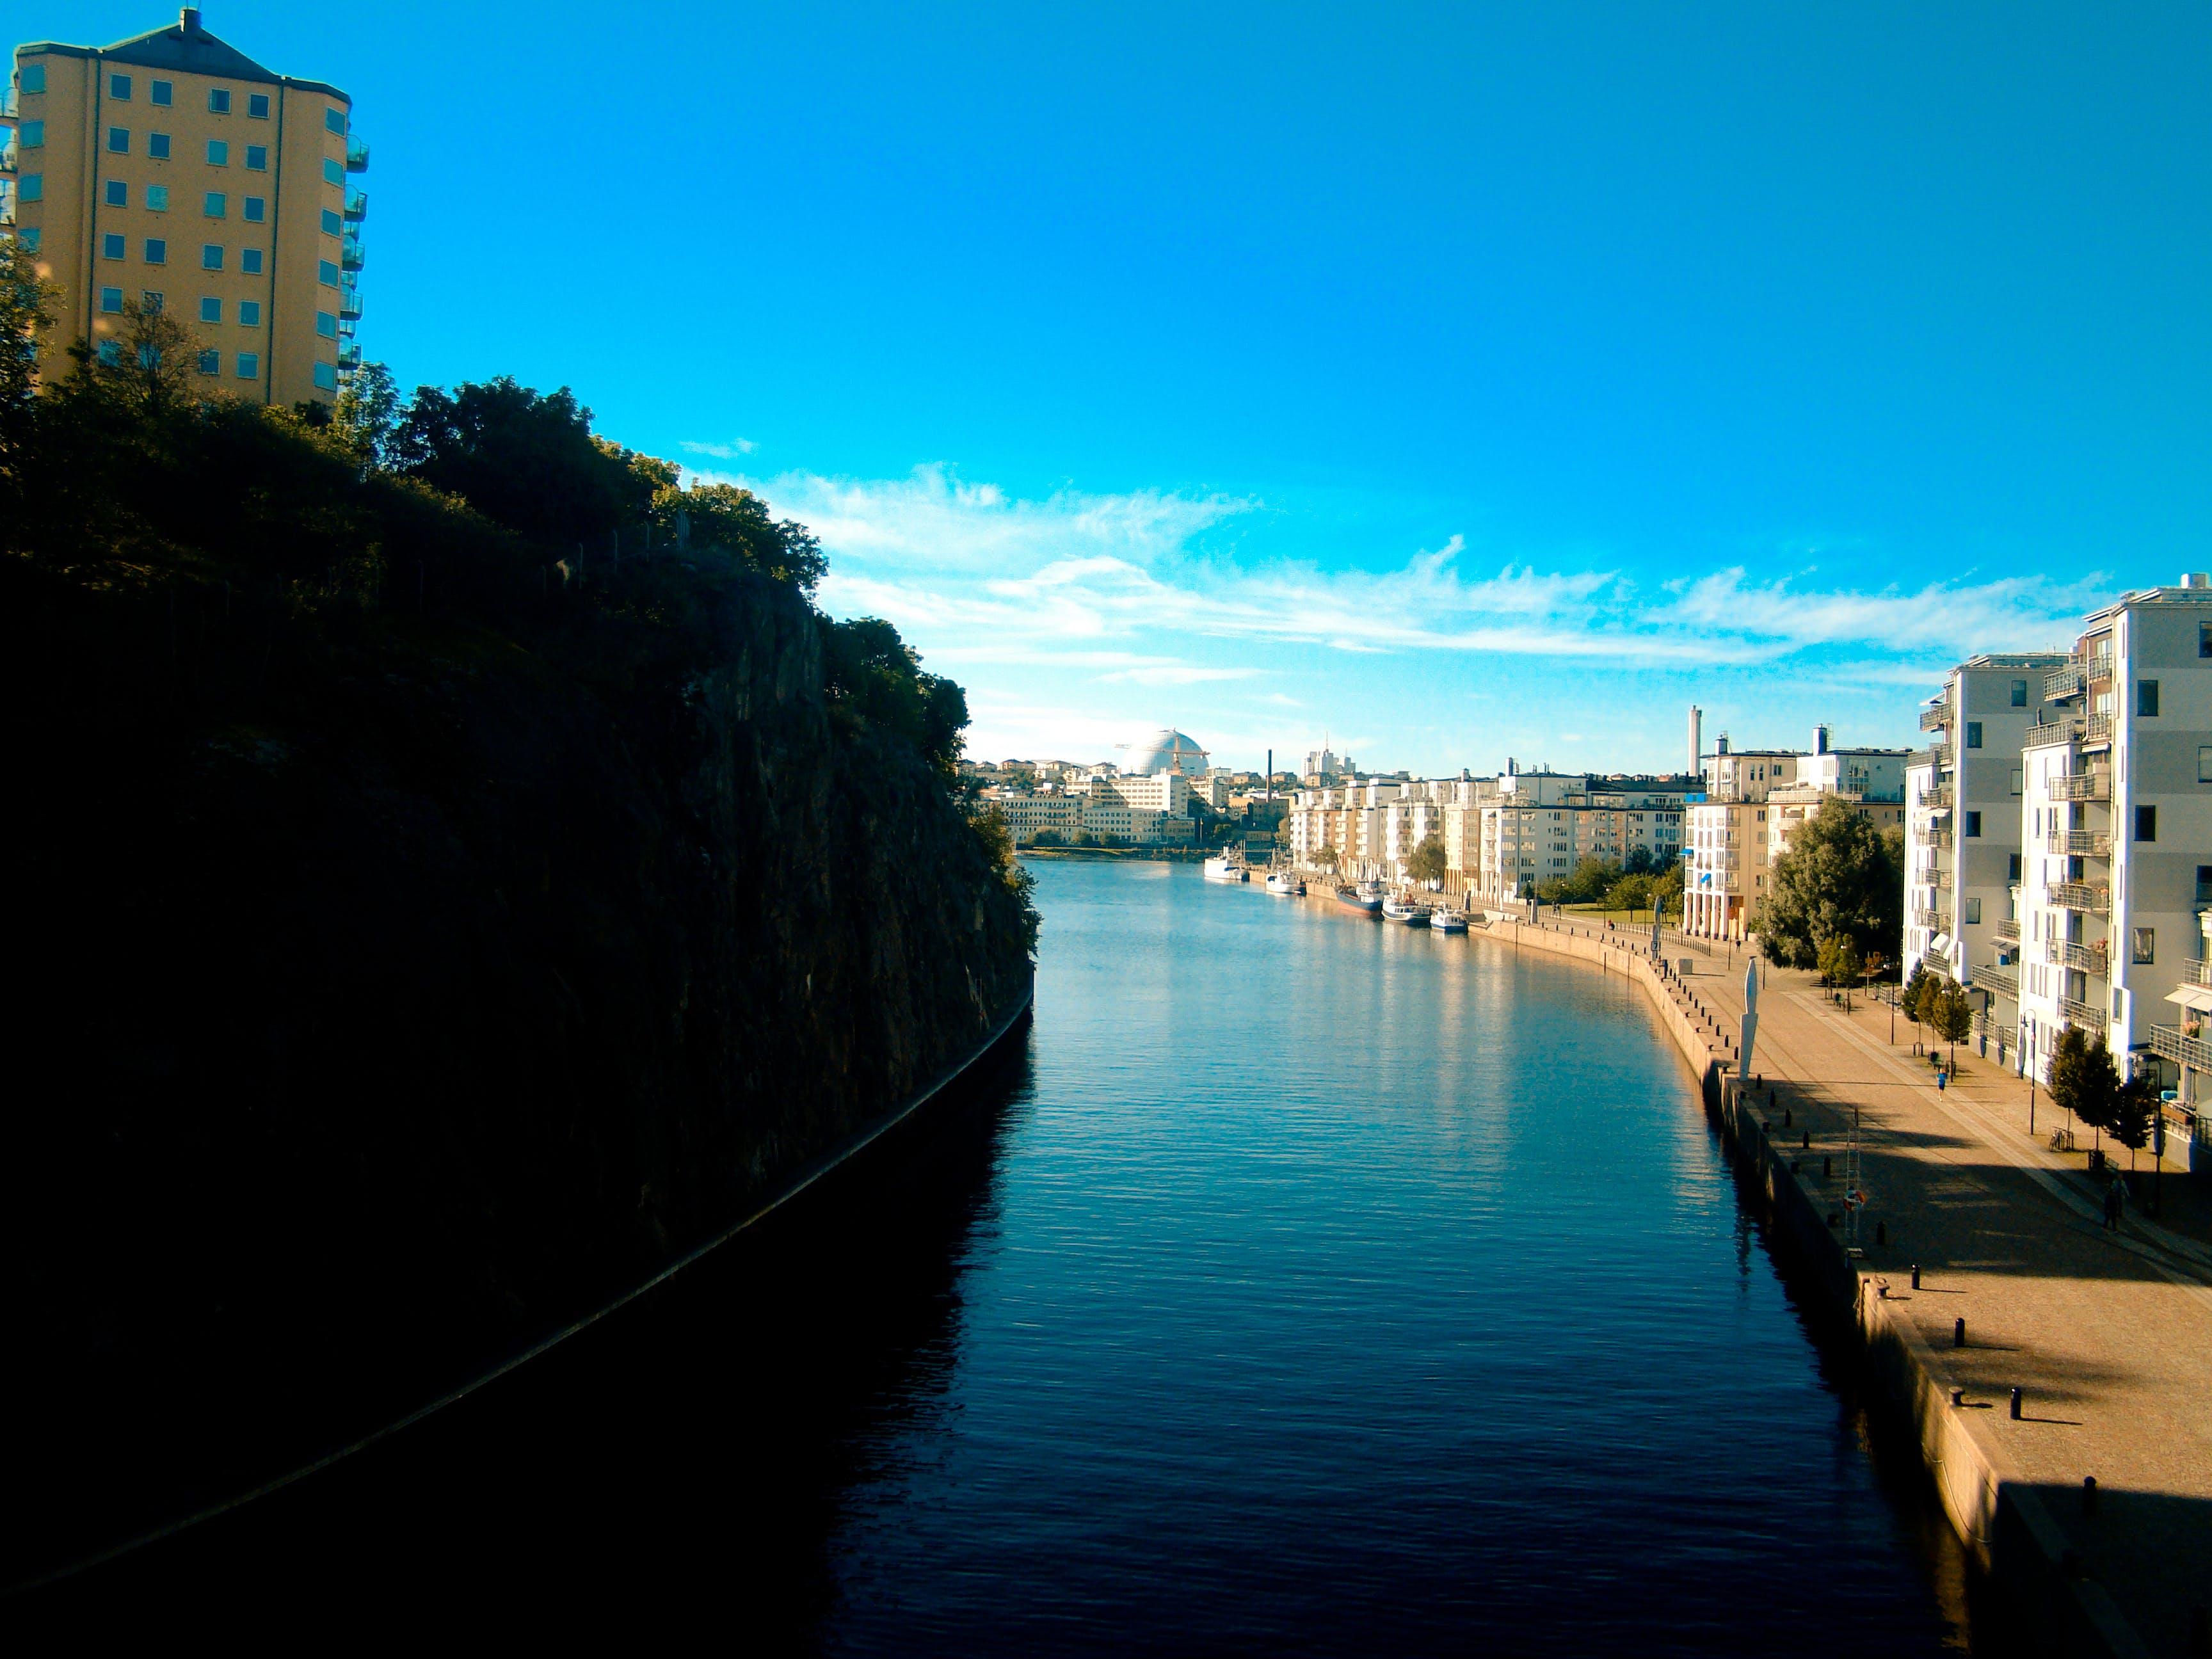 Free stock photo of city, canel